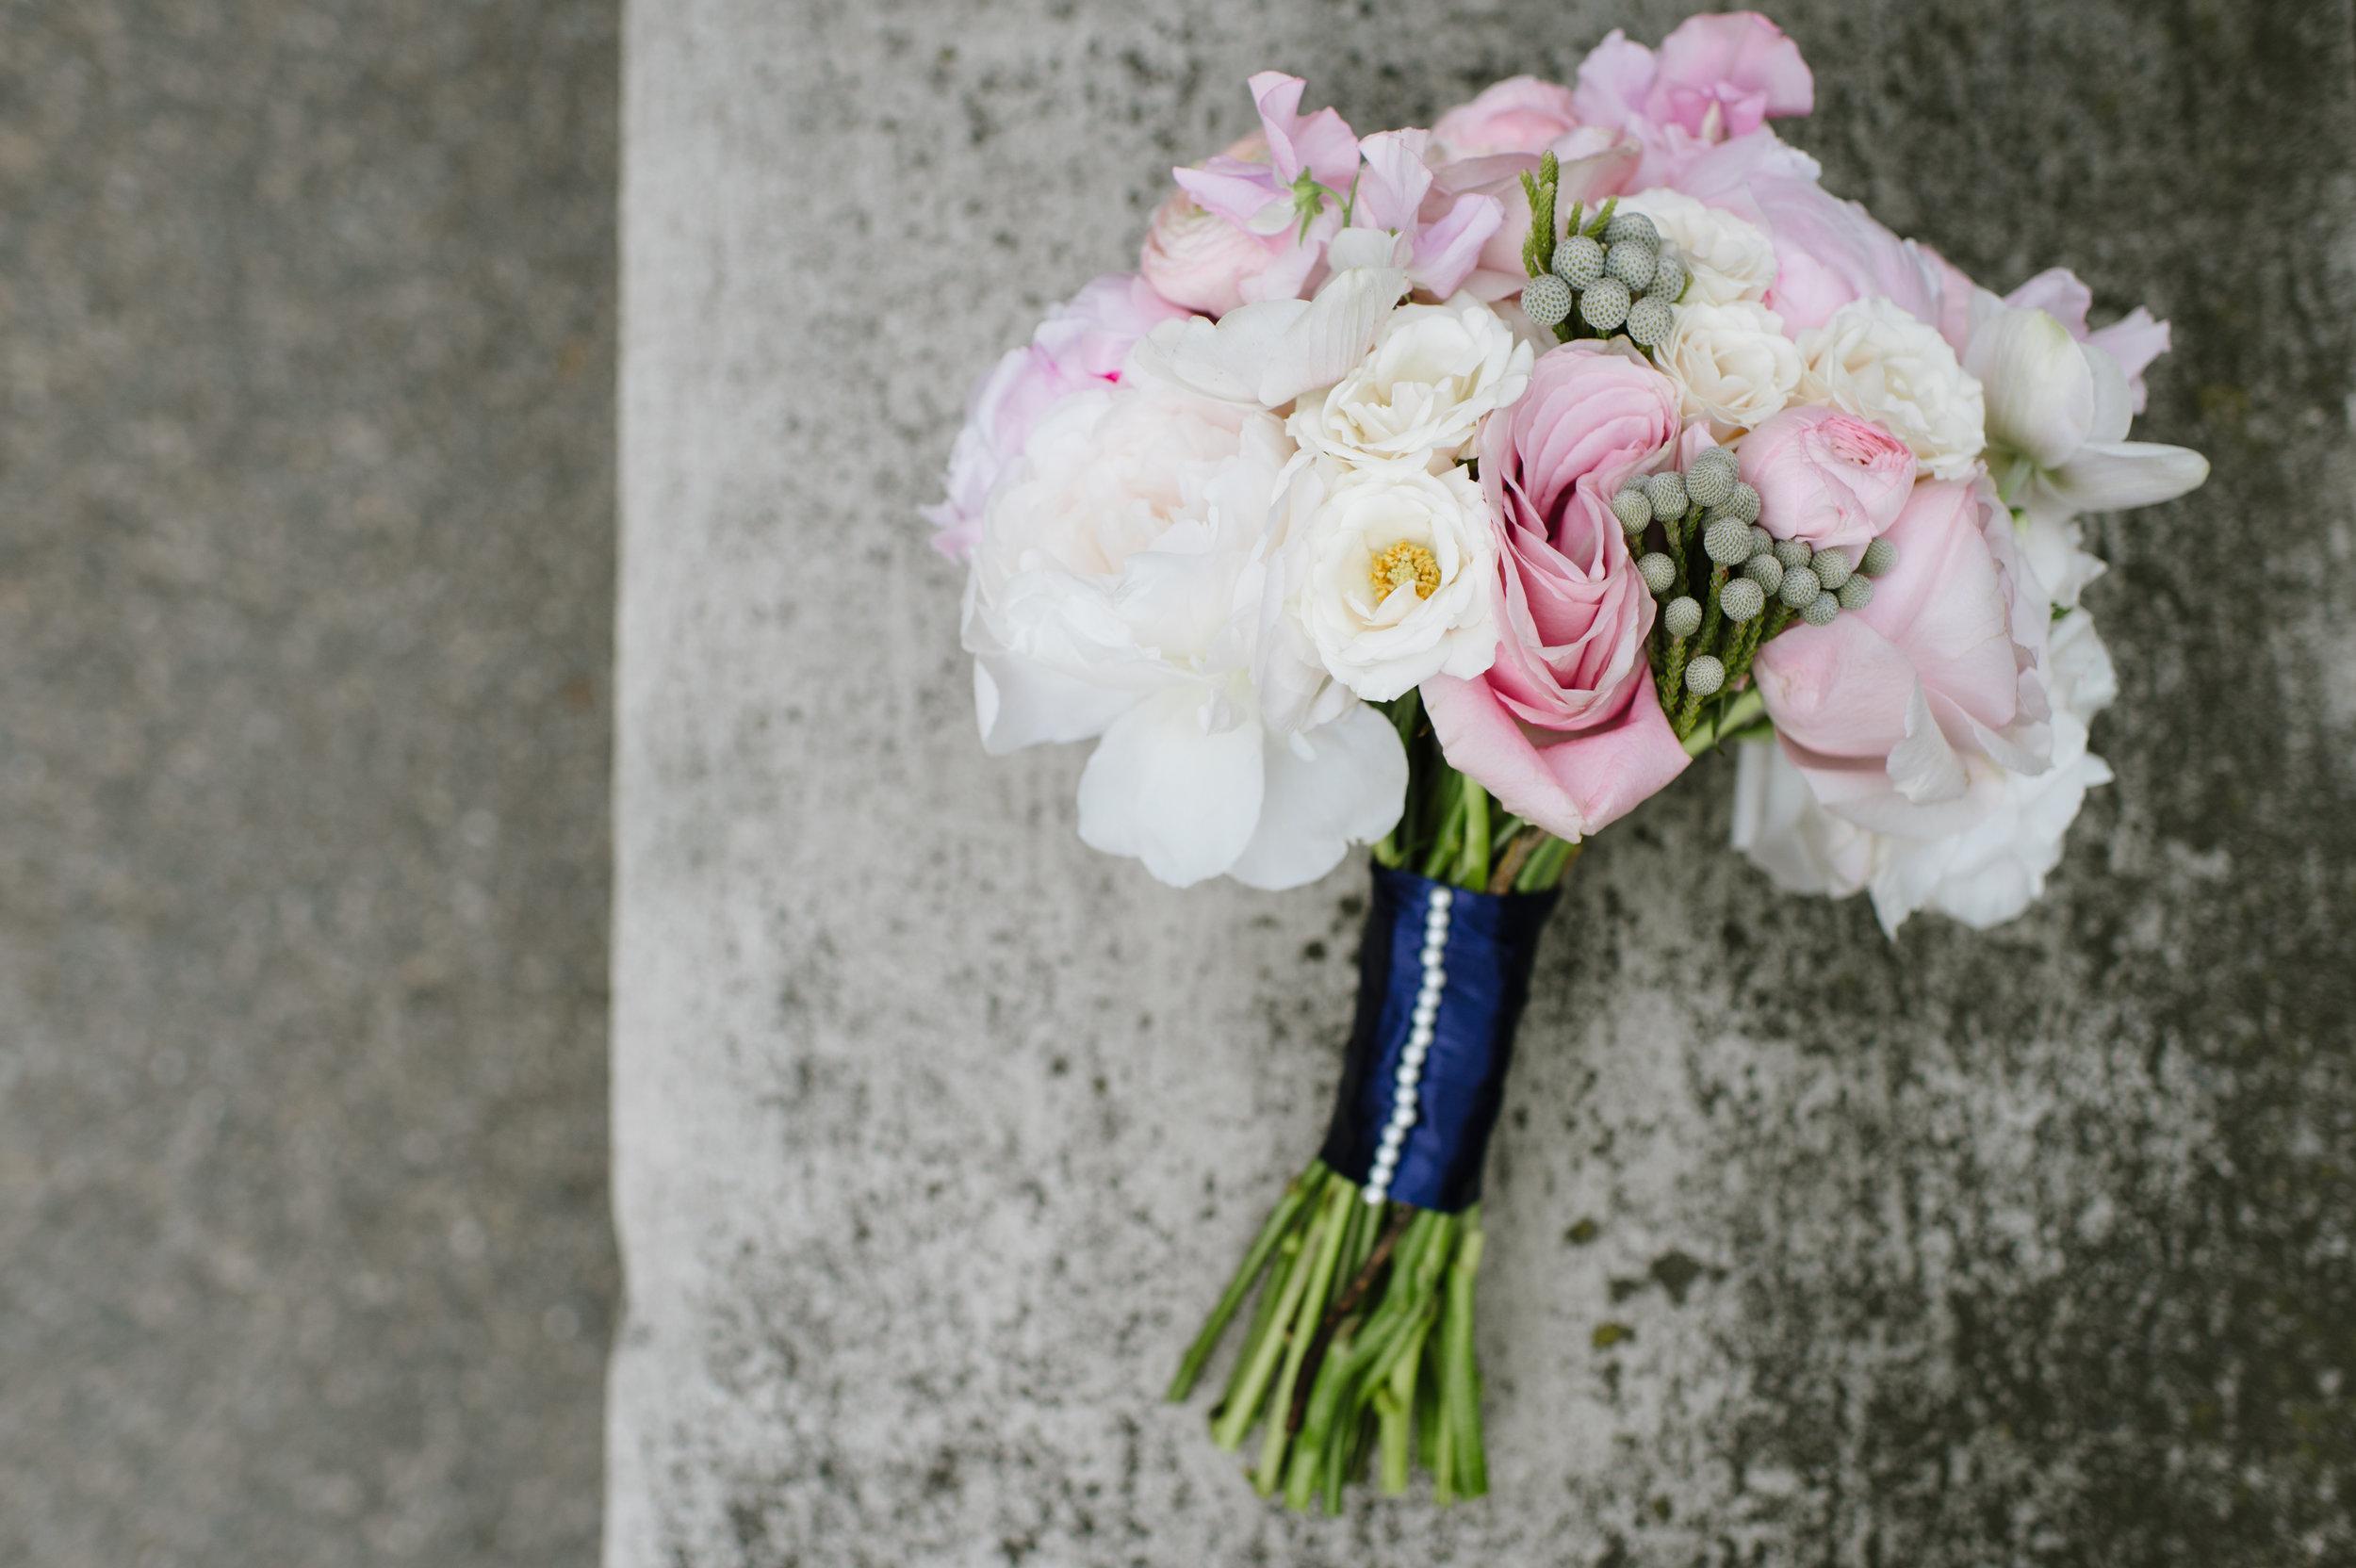 Fairmont-Copley-Wedding025.jpg